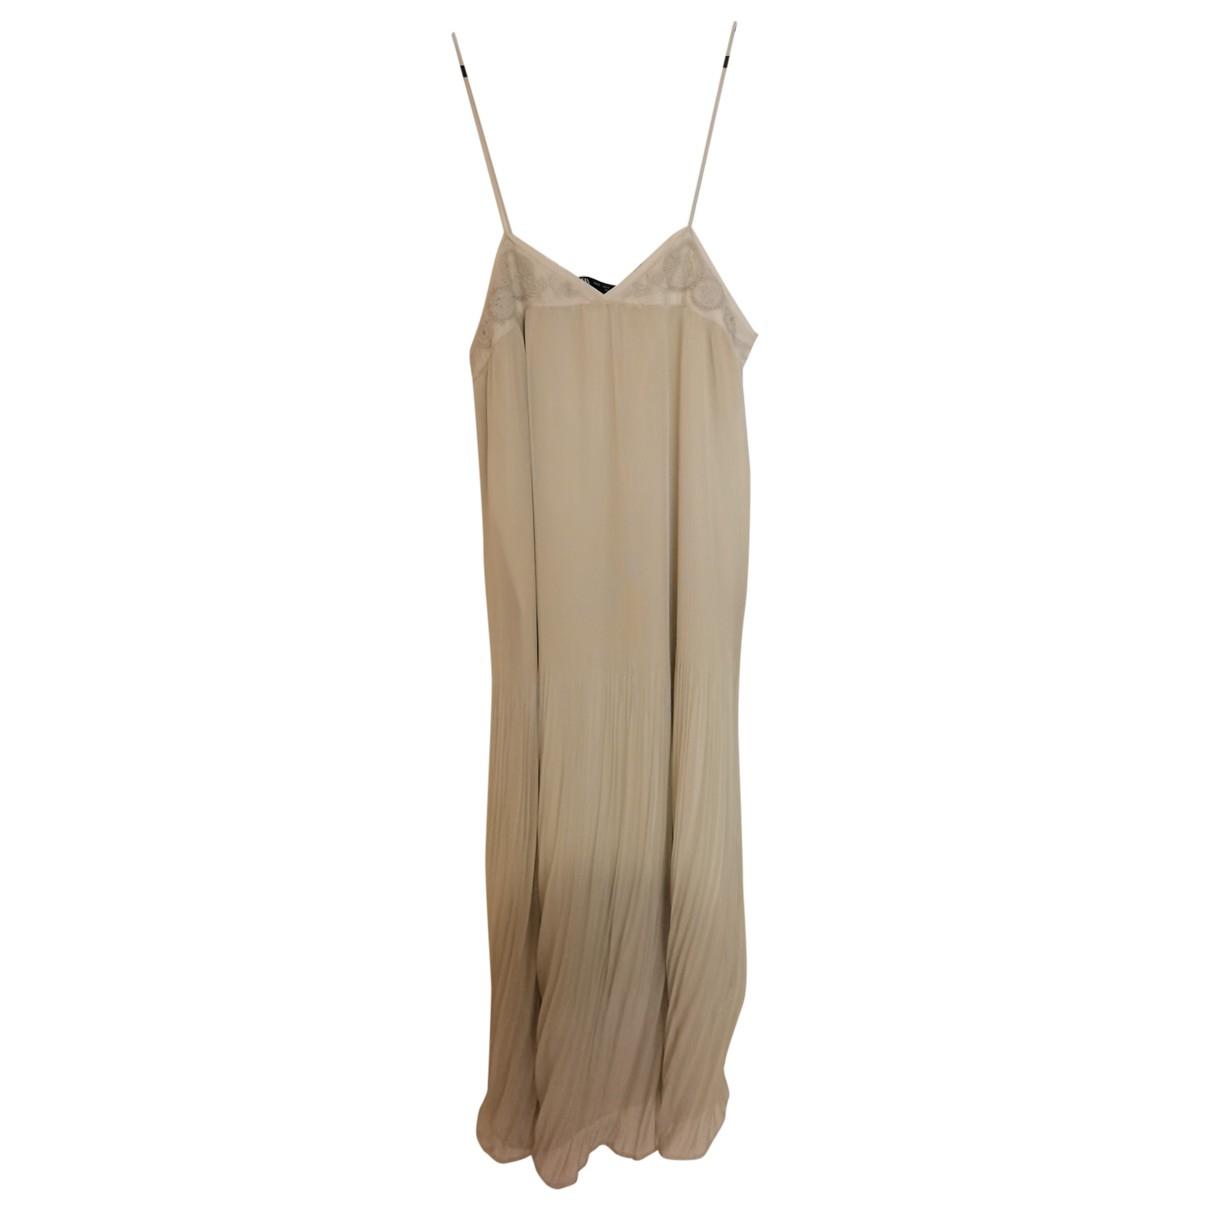 Zara \N Grey Lace dress for Women S International